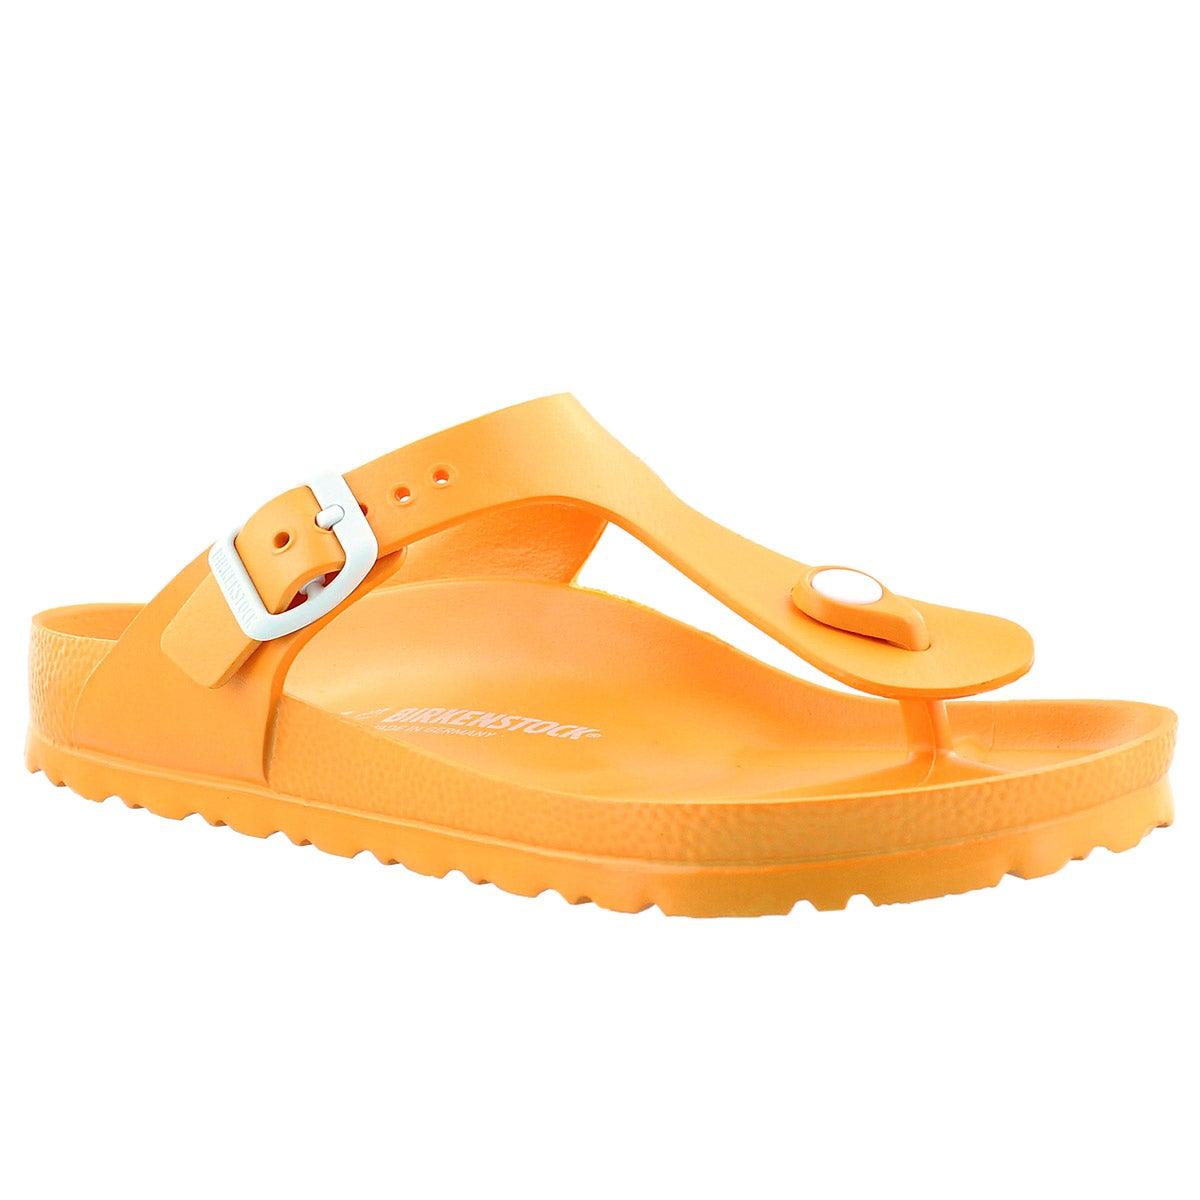 Lds Gizeh EVA neon orange thong sandal